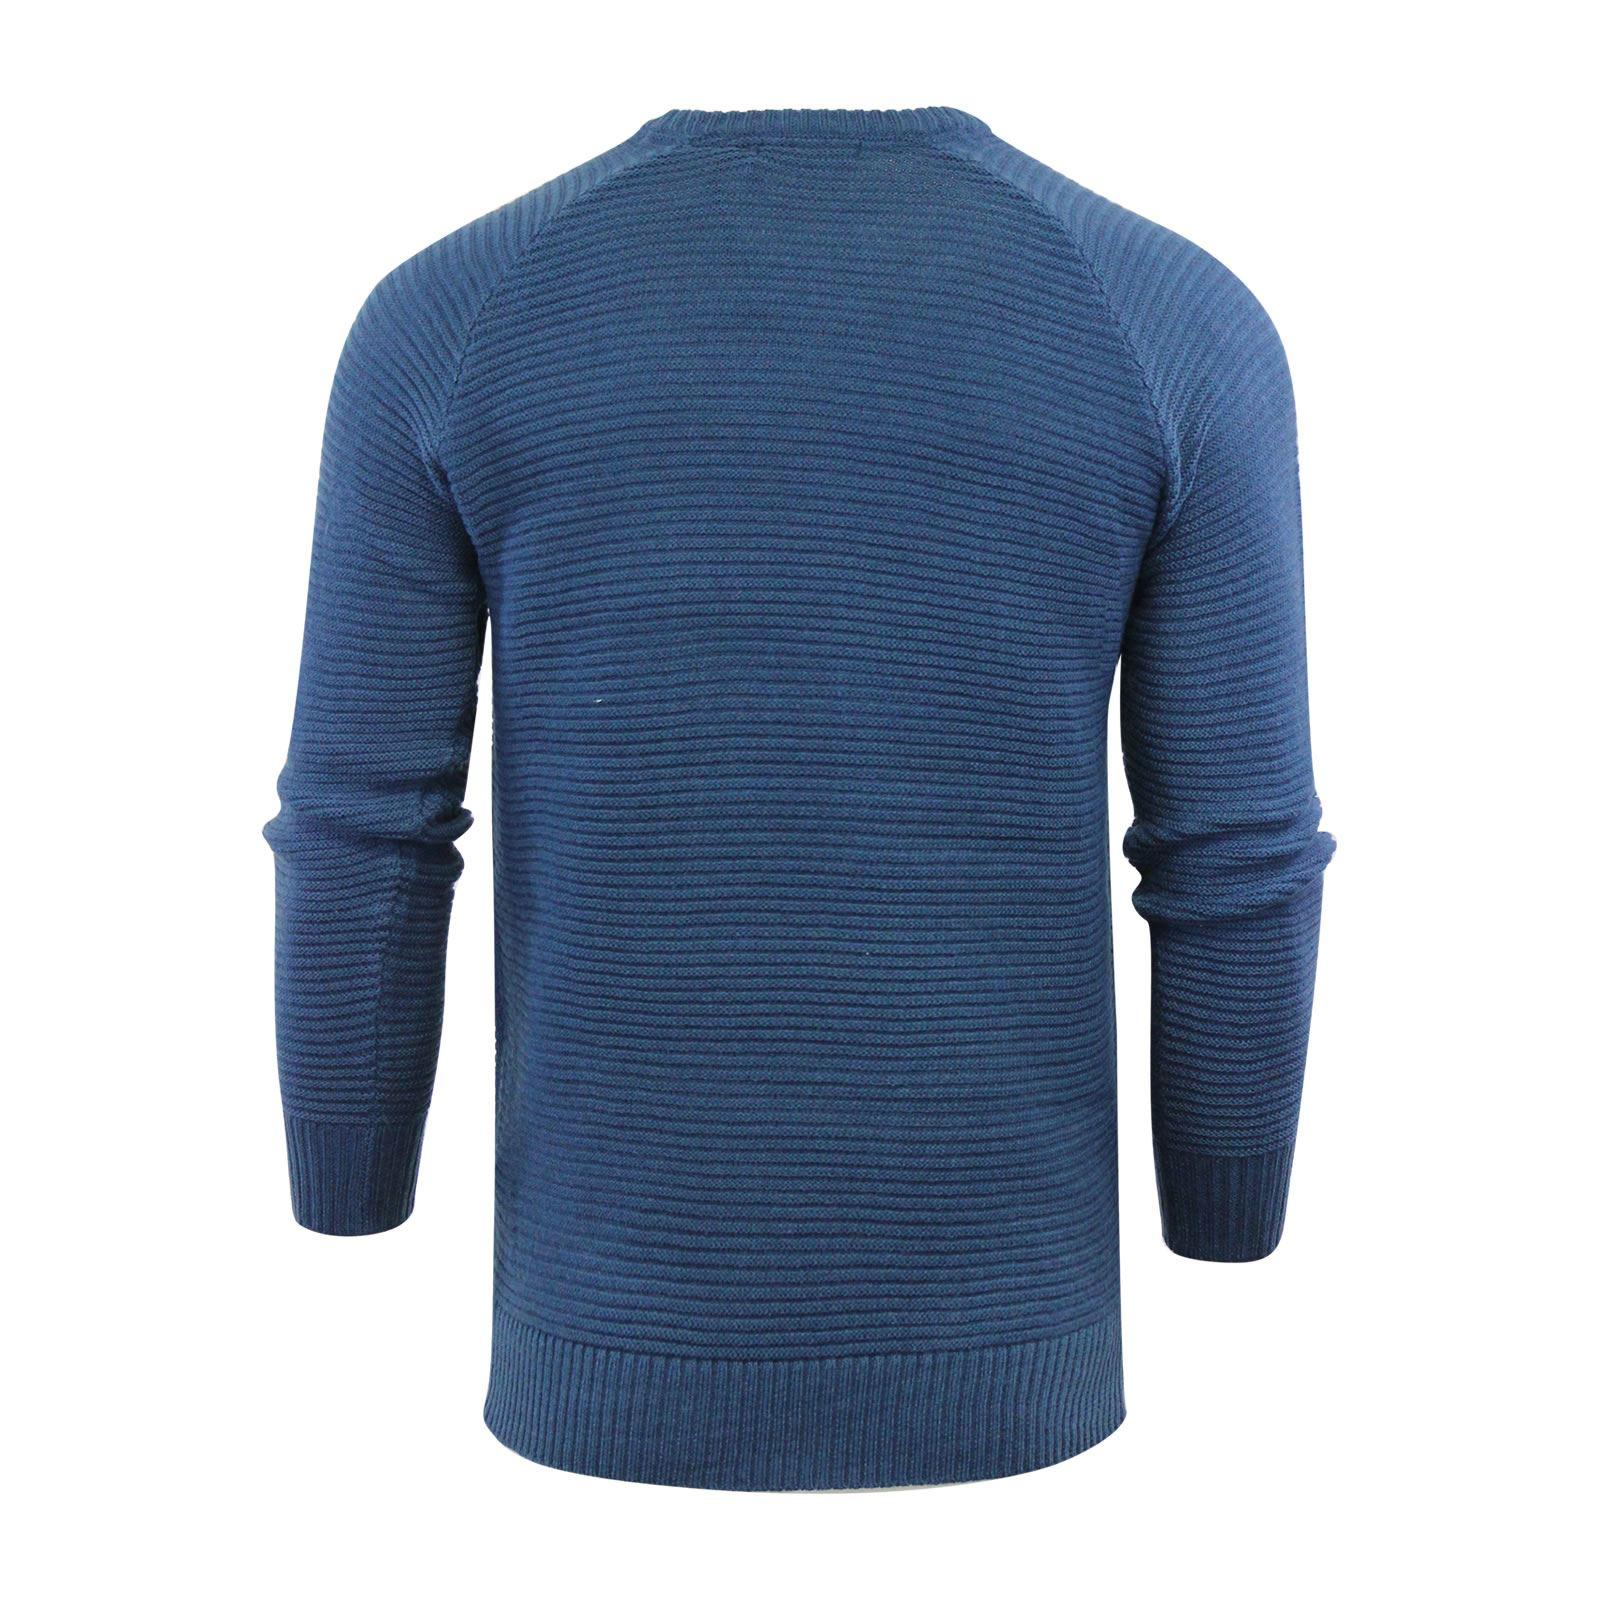 Brave Soul Pineco Mens Jumper Ribbed Crew Neck Sweater